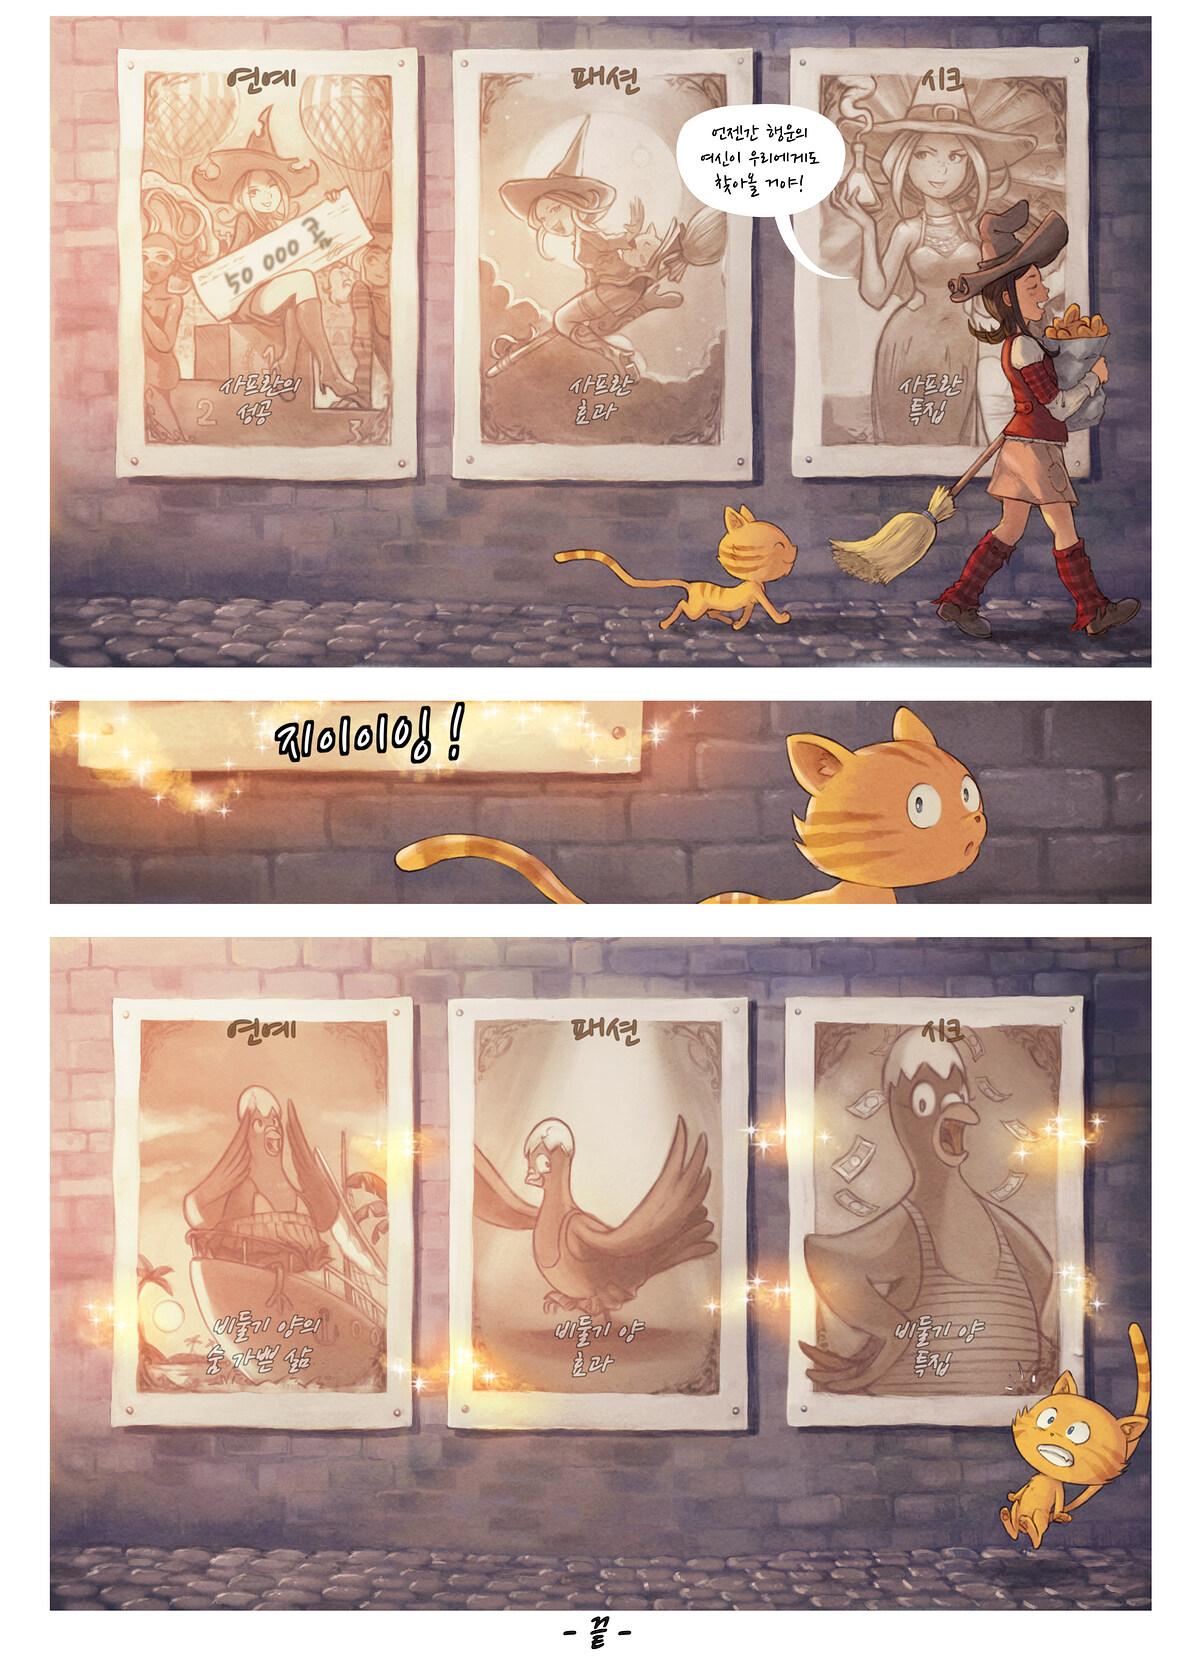 A webcomic page of Pepper&Carrot, 에피소드 23 [kr], 페이지 7